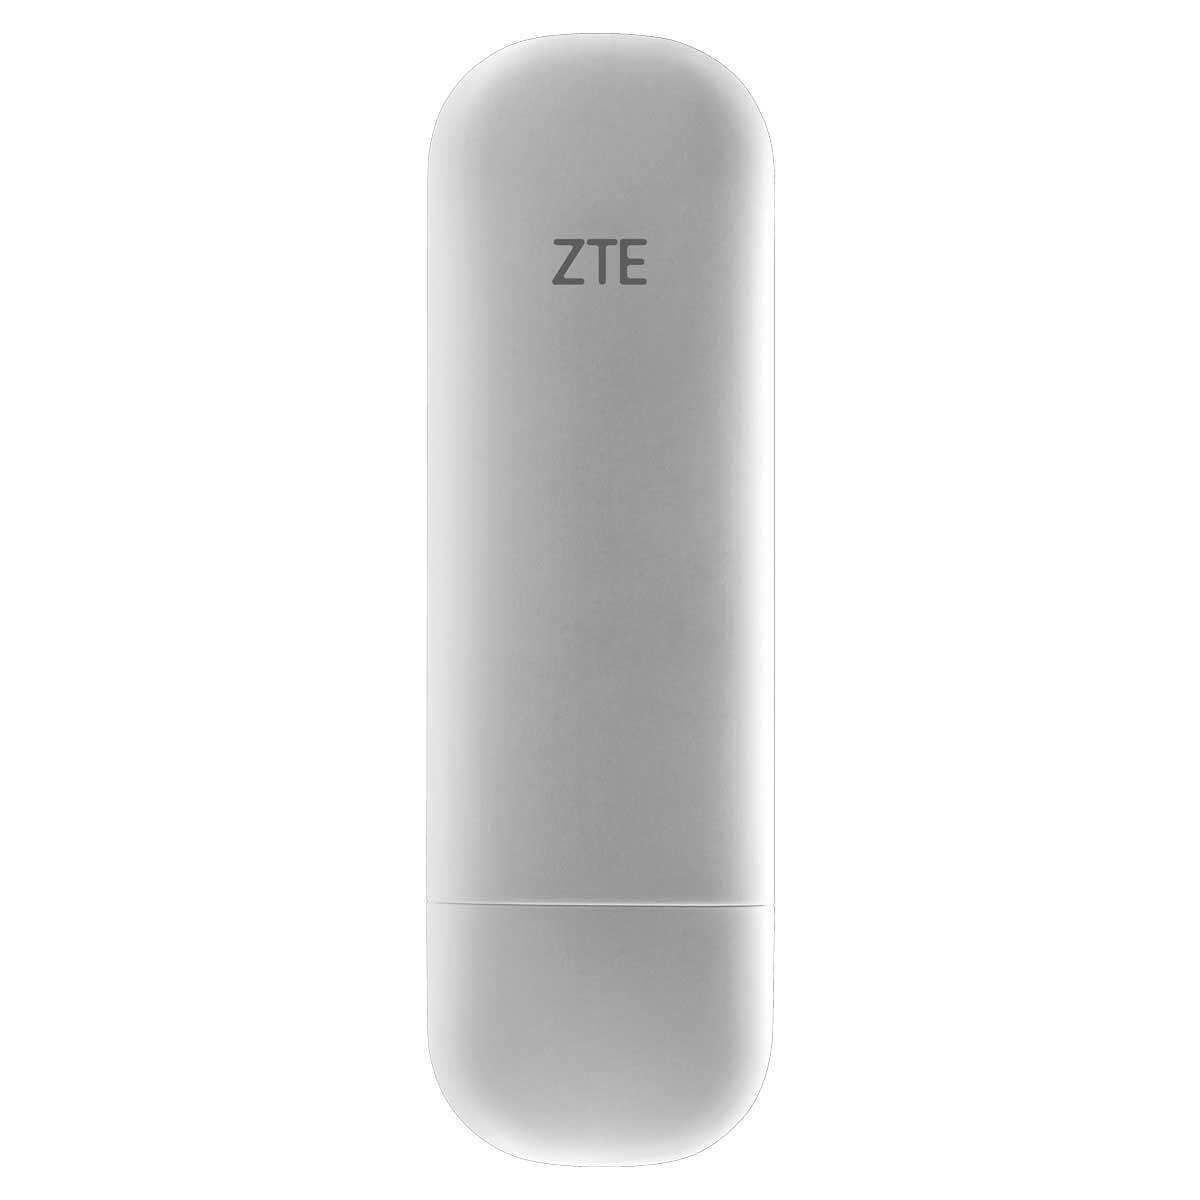 ZTE 3G/HSPA+ USB Modem (21Mbps)